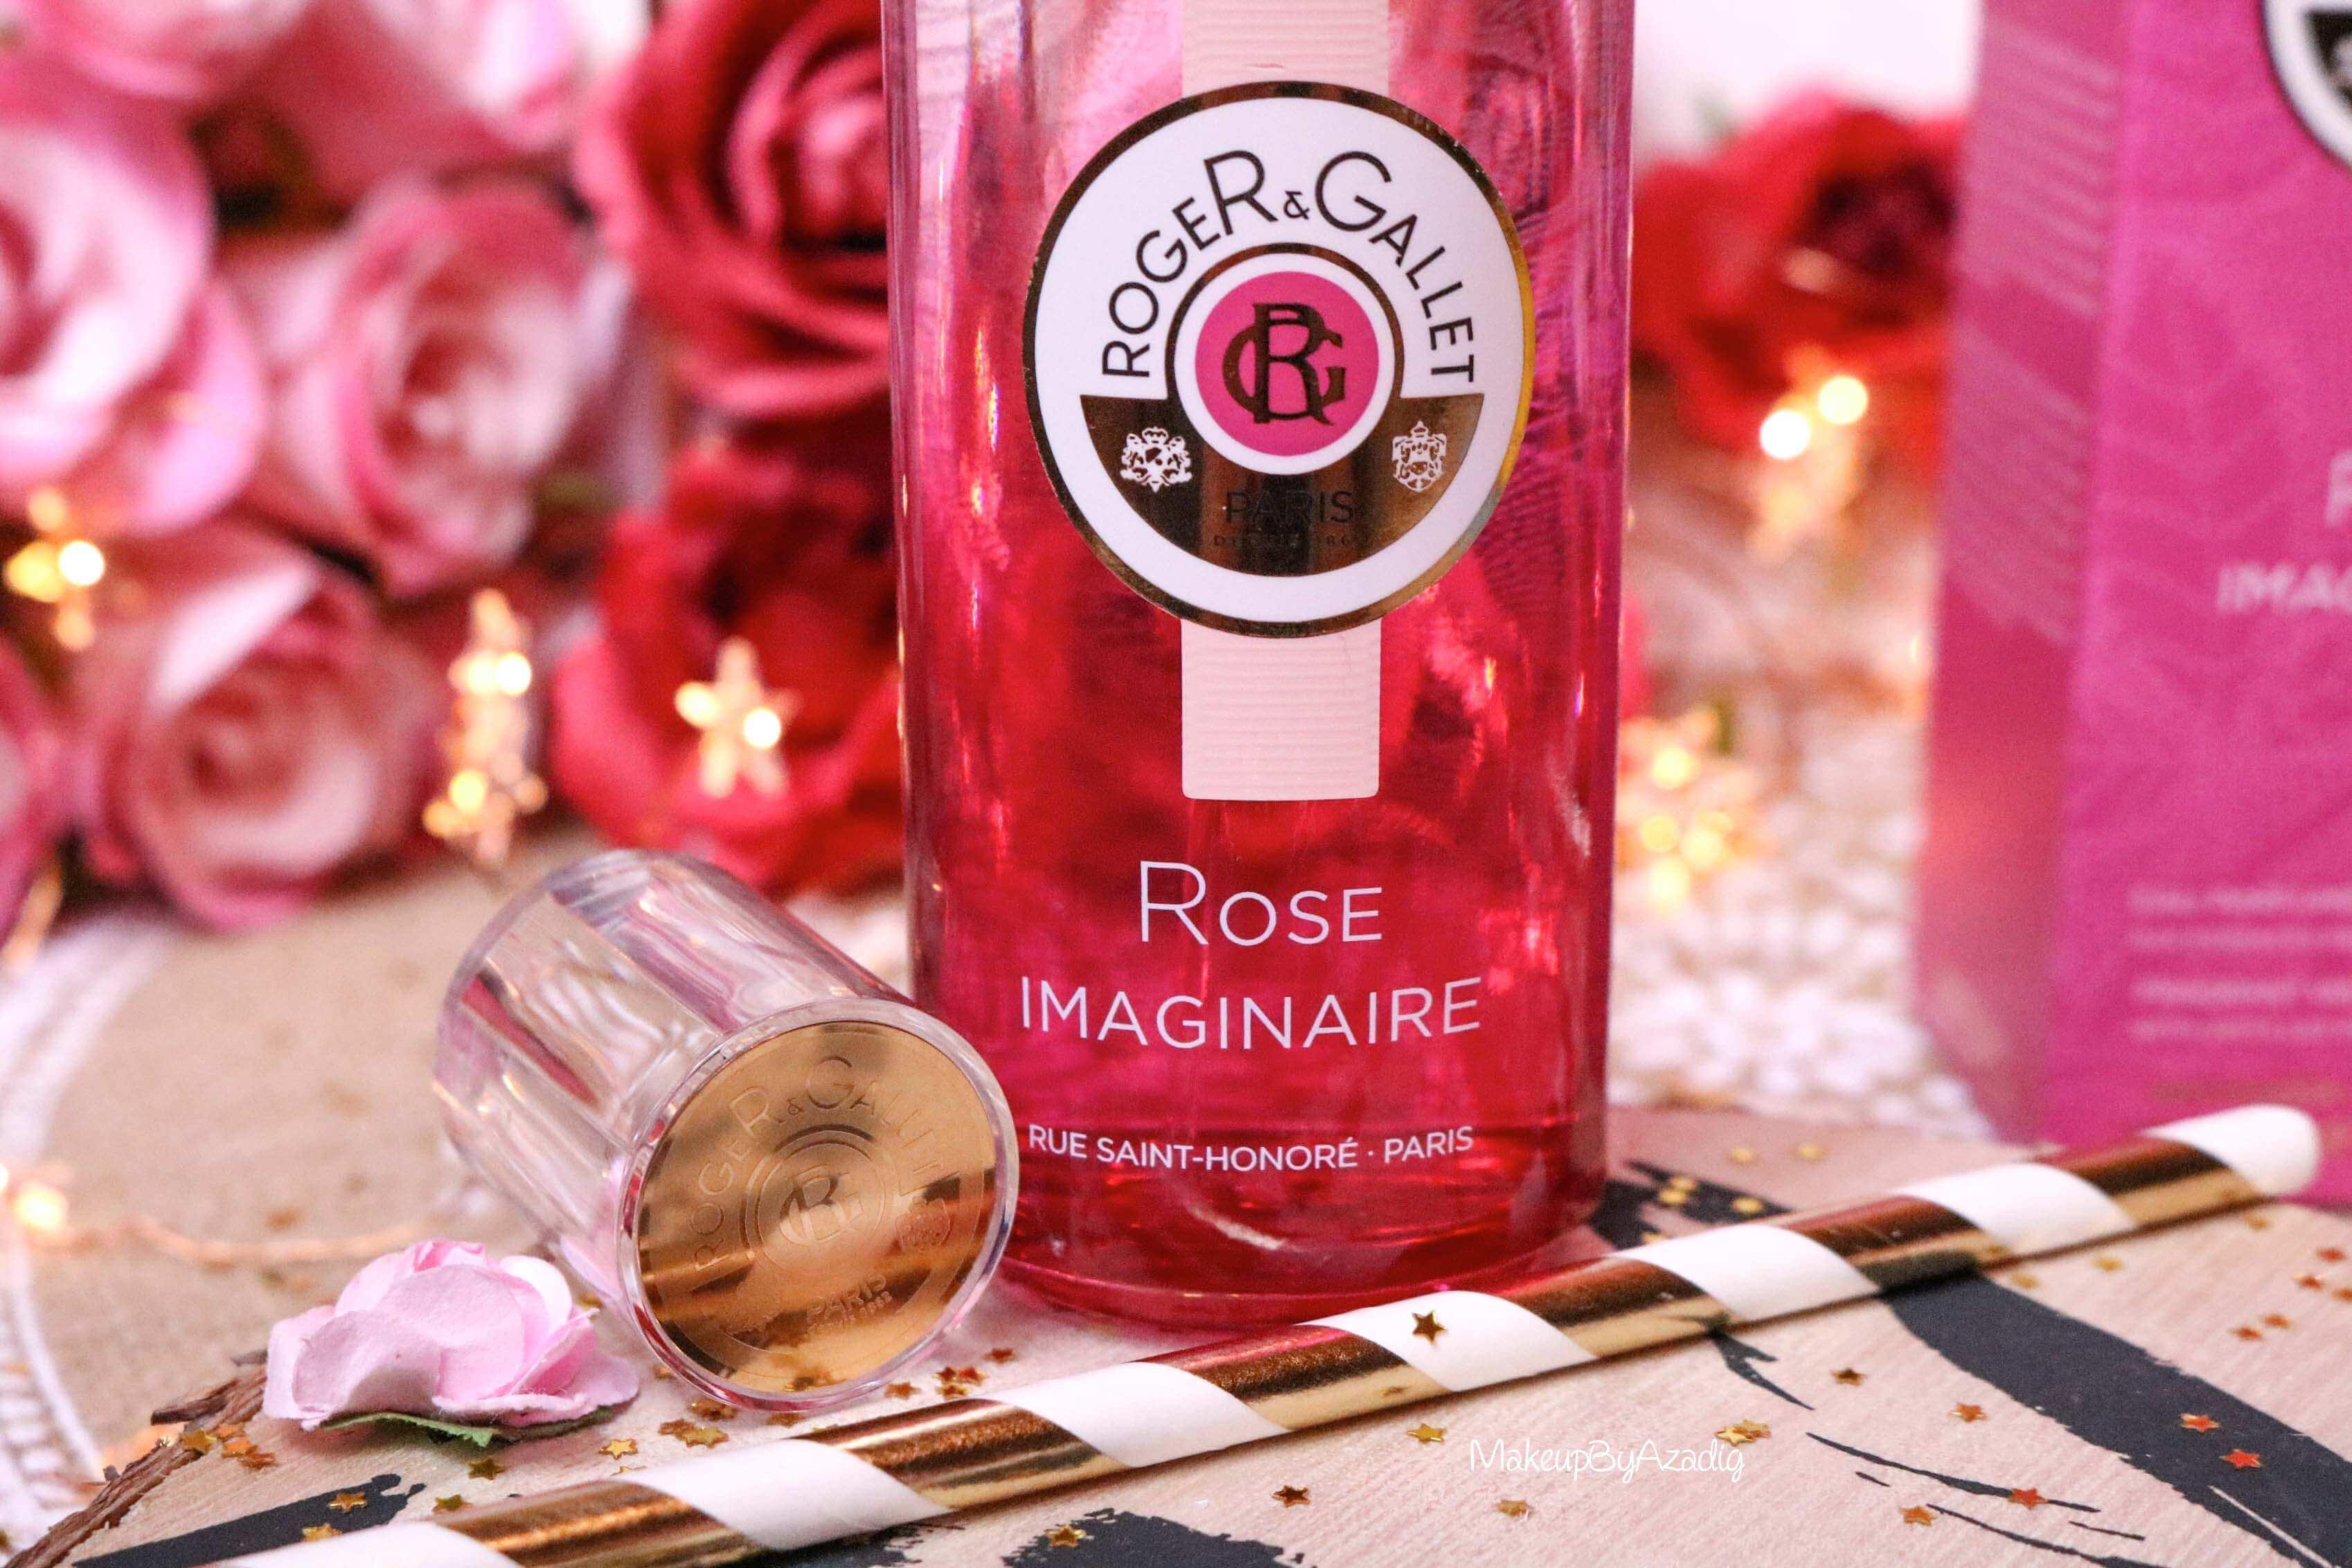 revue-eau-parfumee-bienfaisante-rose-imaginaire-roger-gallet-makeupbyazadig-parfum-bonne-tenue-avis-prix-monoprix-zoom